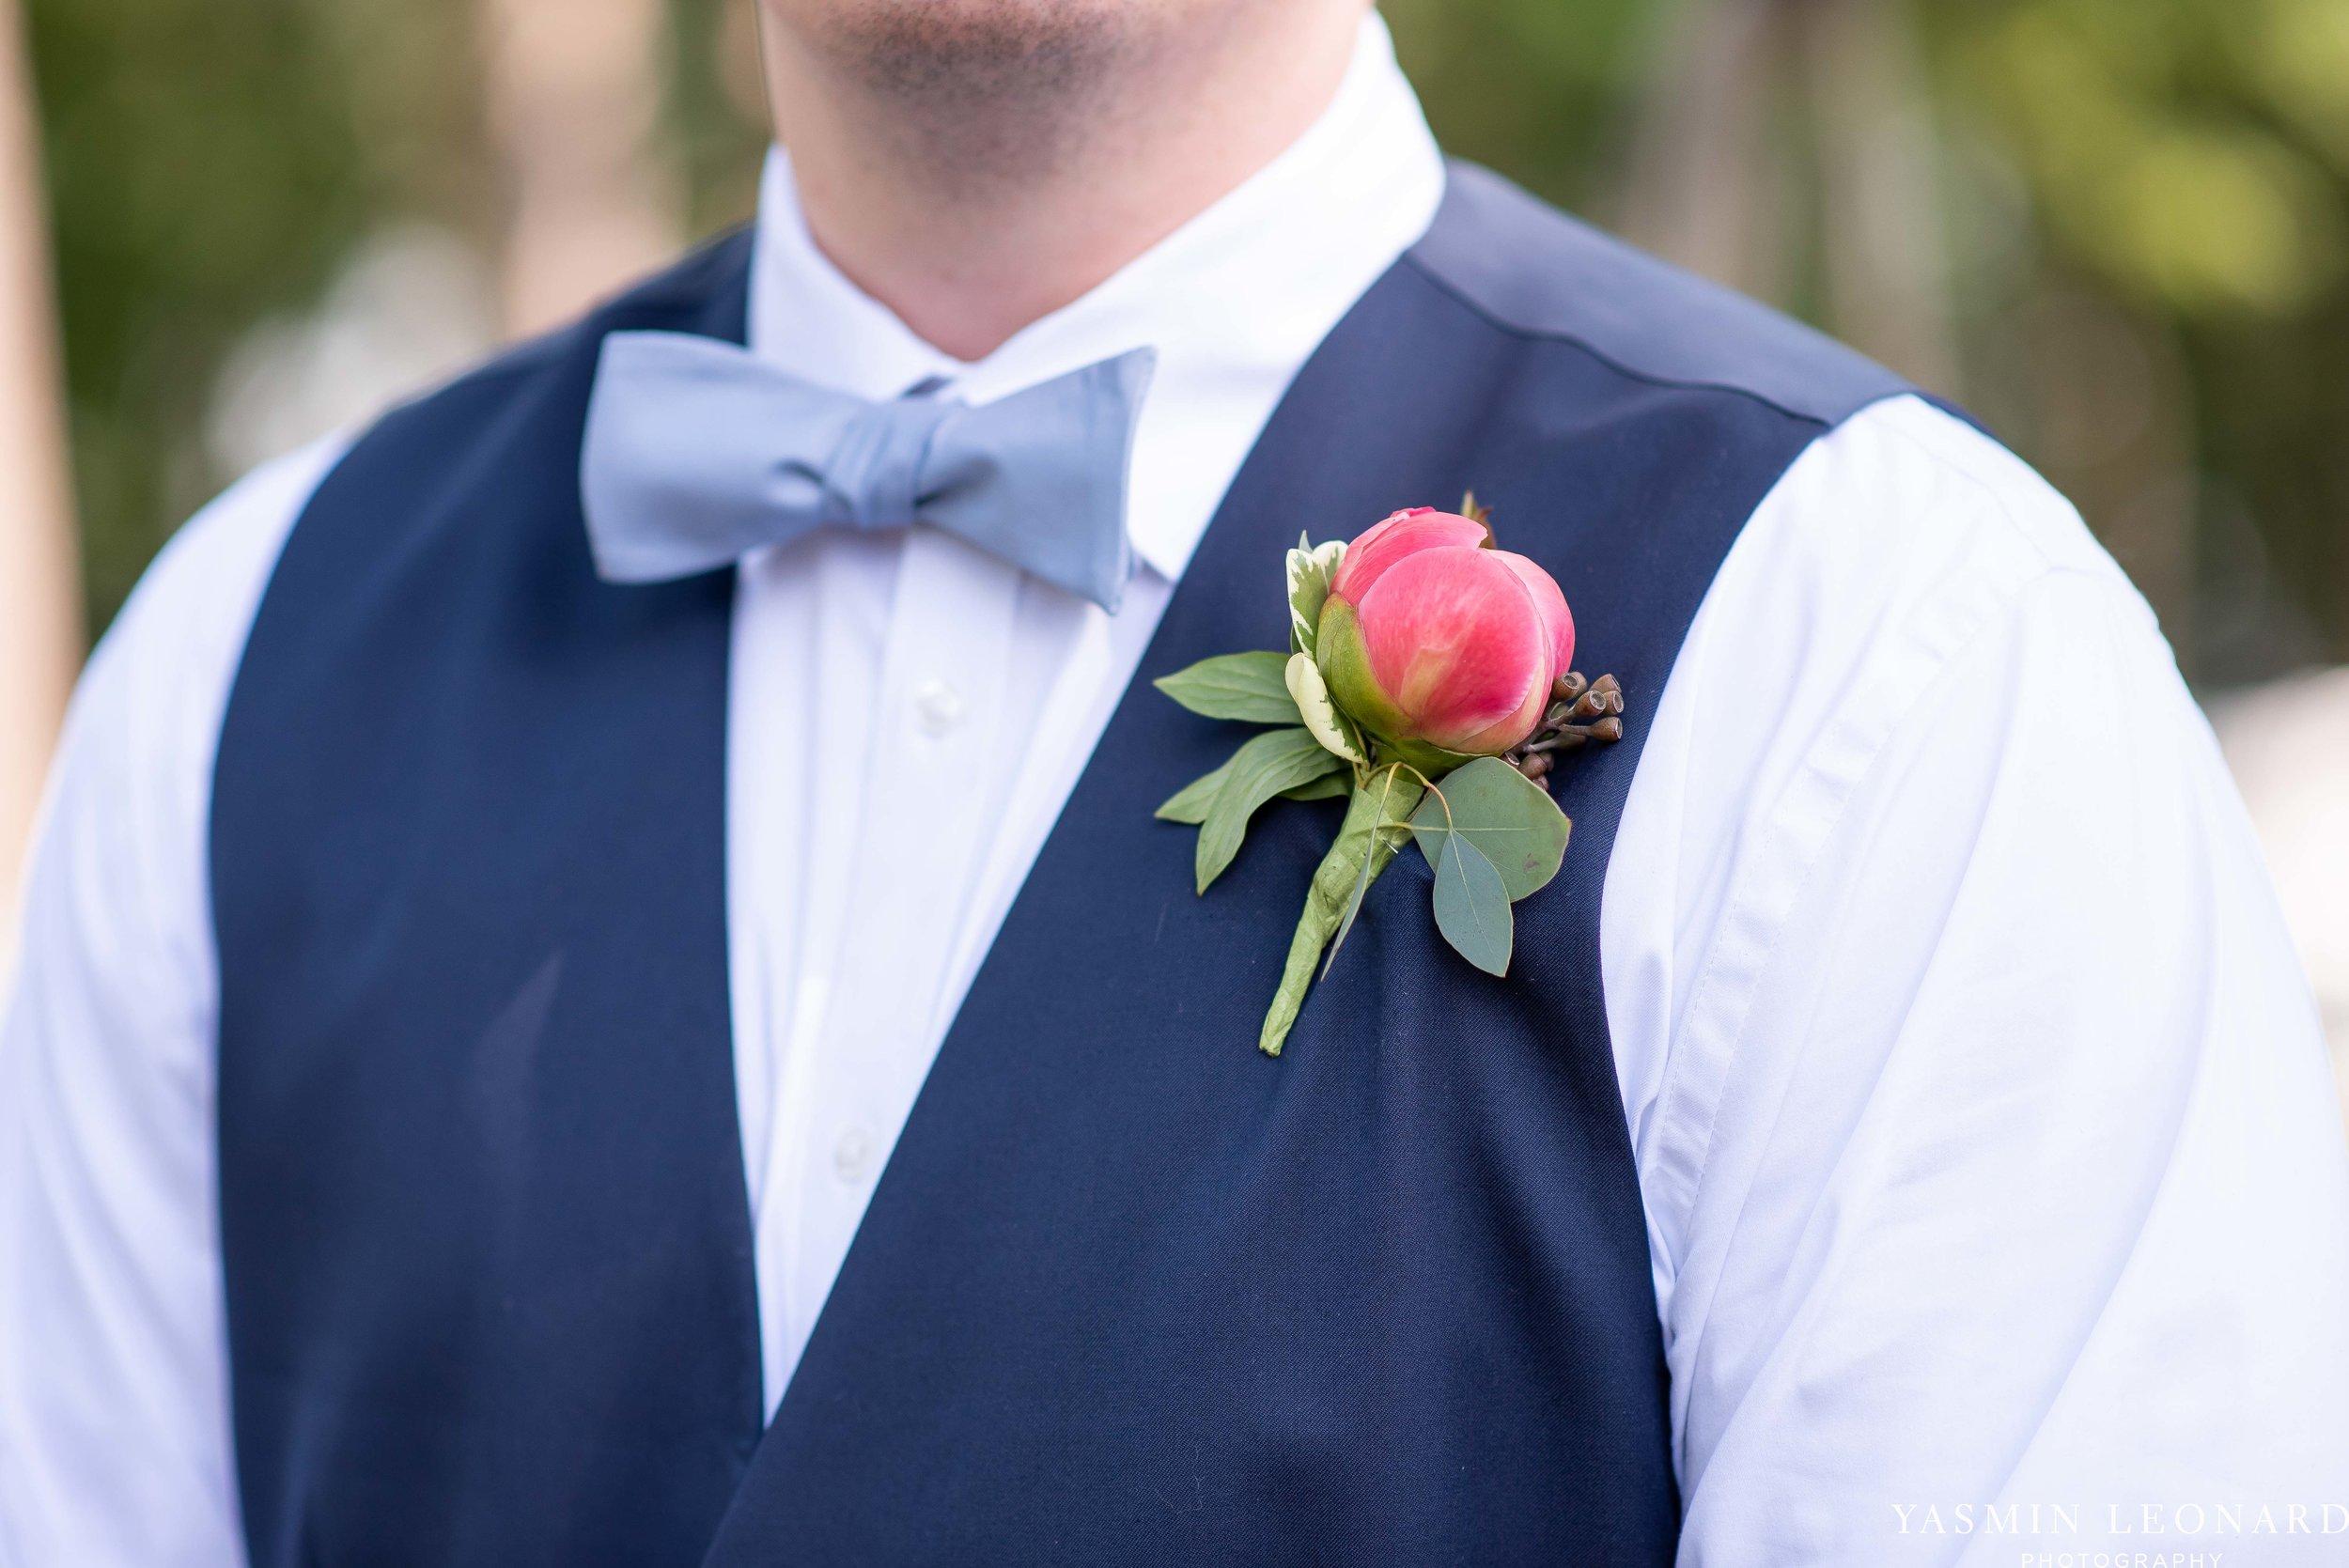 Old Homeplace Vineyard - NC Weddings - Outdoor Summer Weddings - Peony Boutique - Vineyard Wedding - NC Photographer - Yasmin Leonard Photography-13.jpg